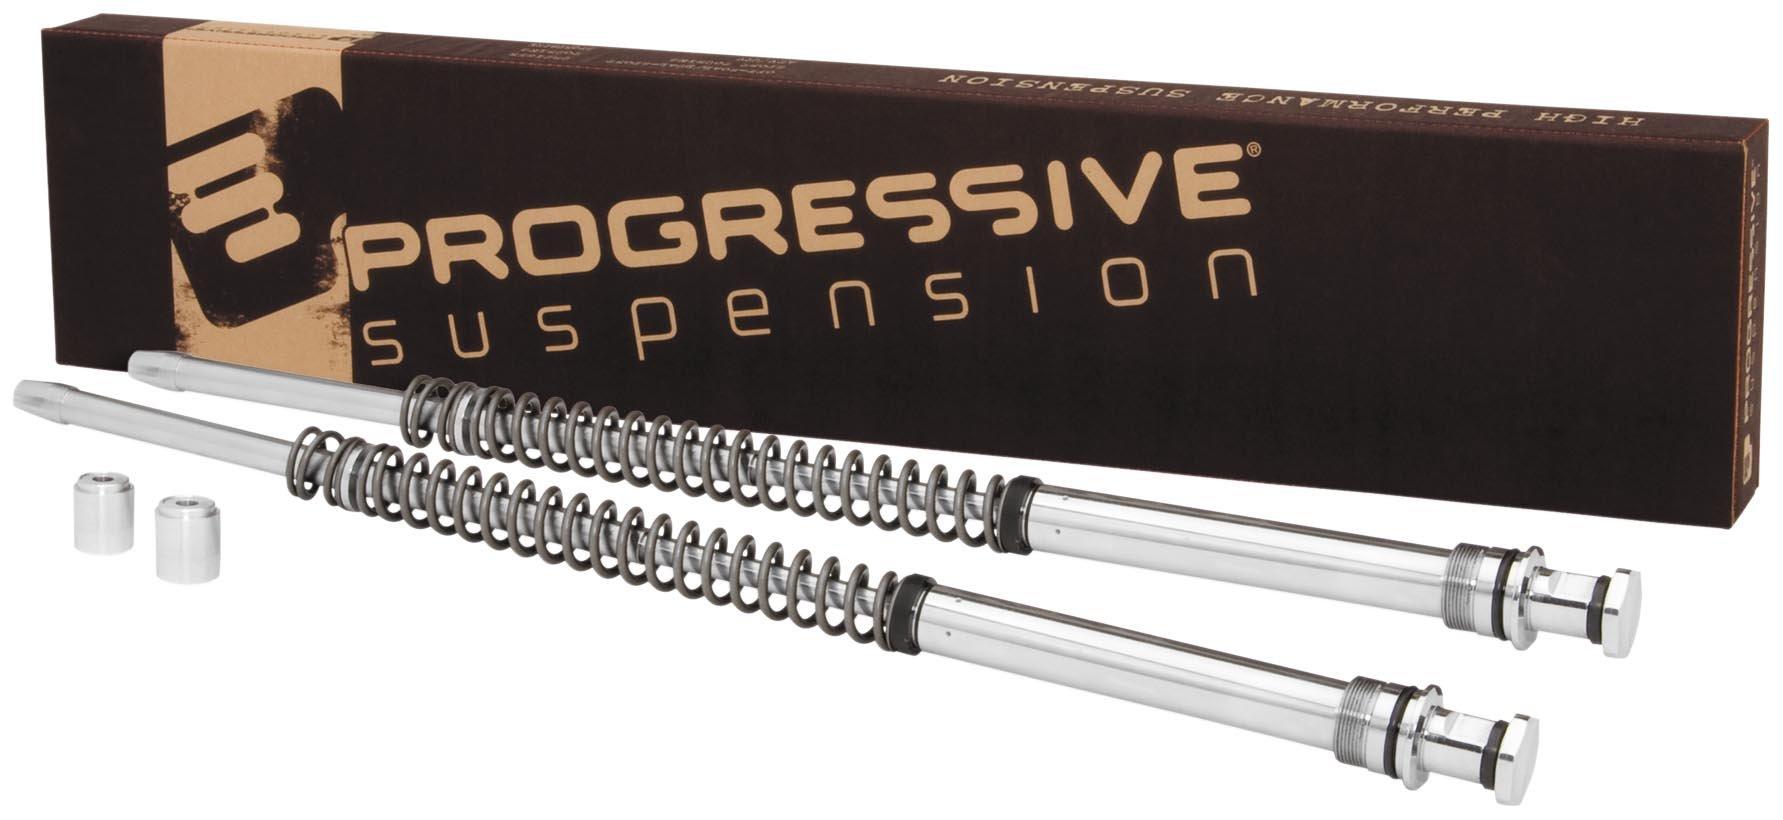 Progressive Suspension Monotube Fork Cartridge Lowering Kit